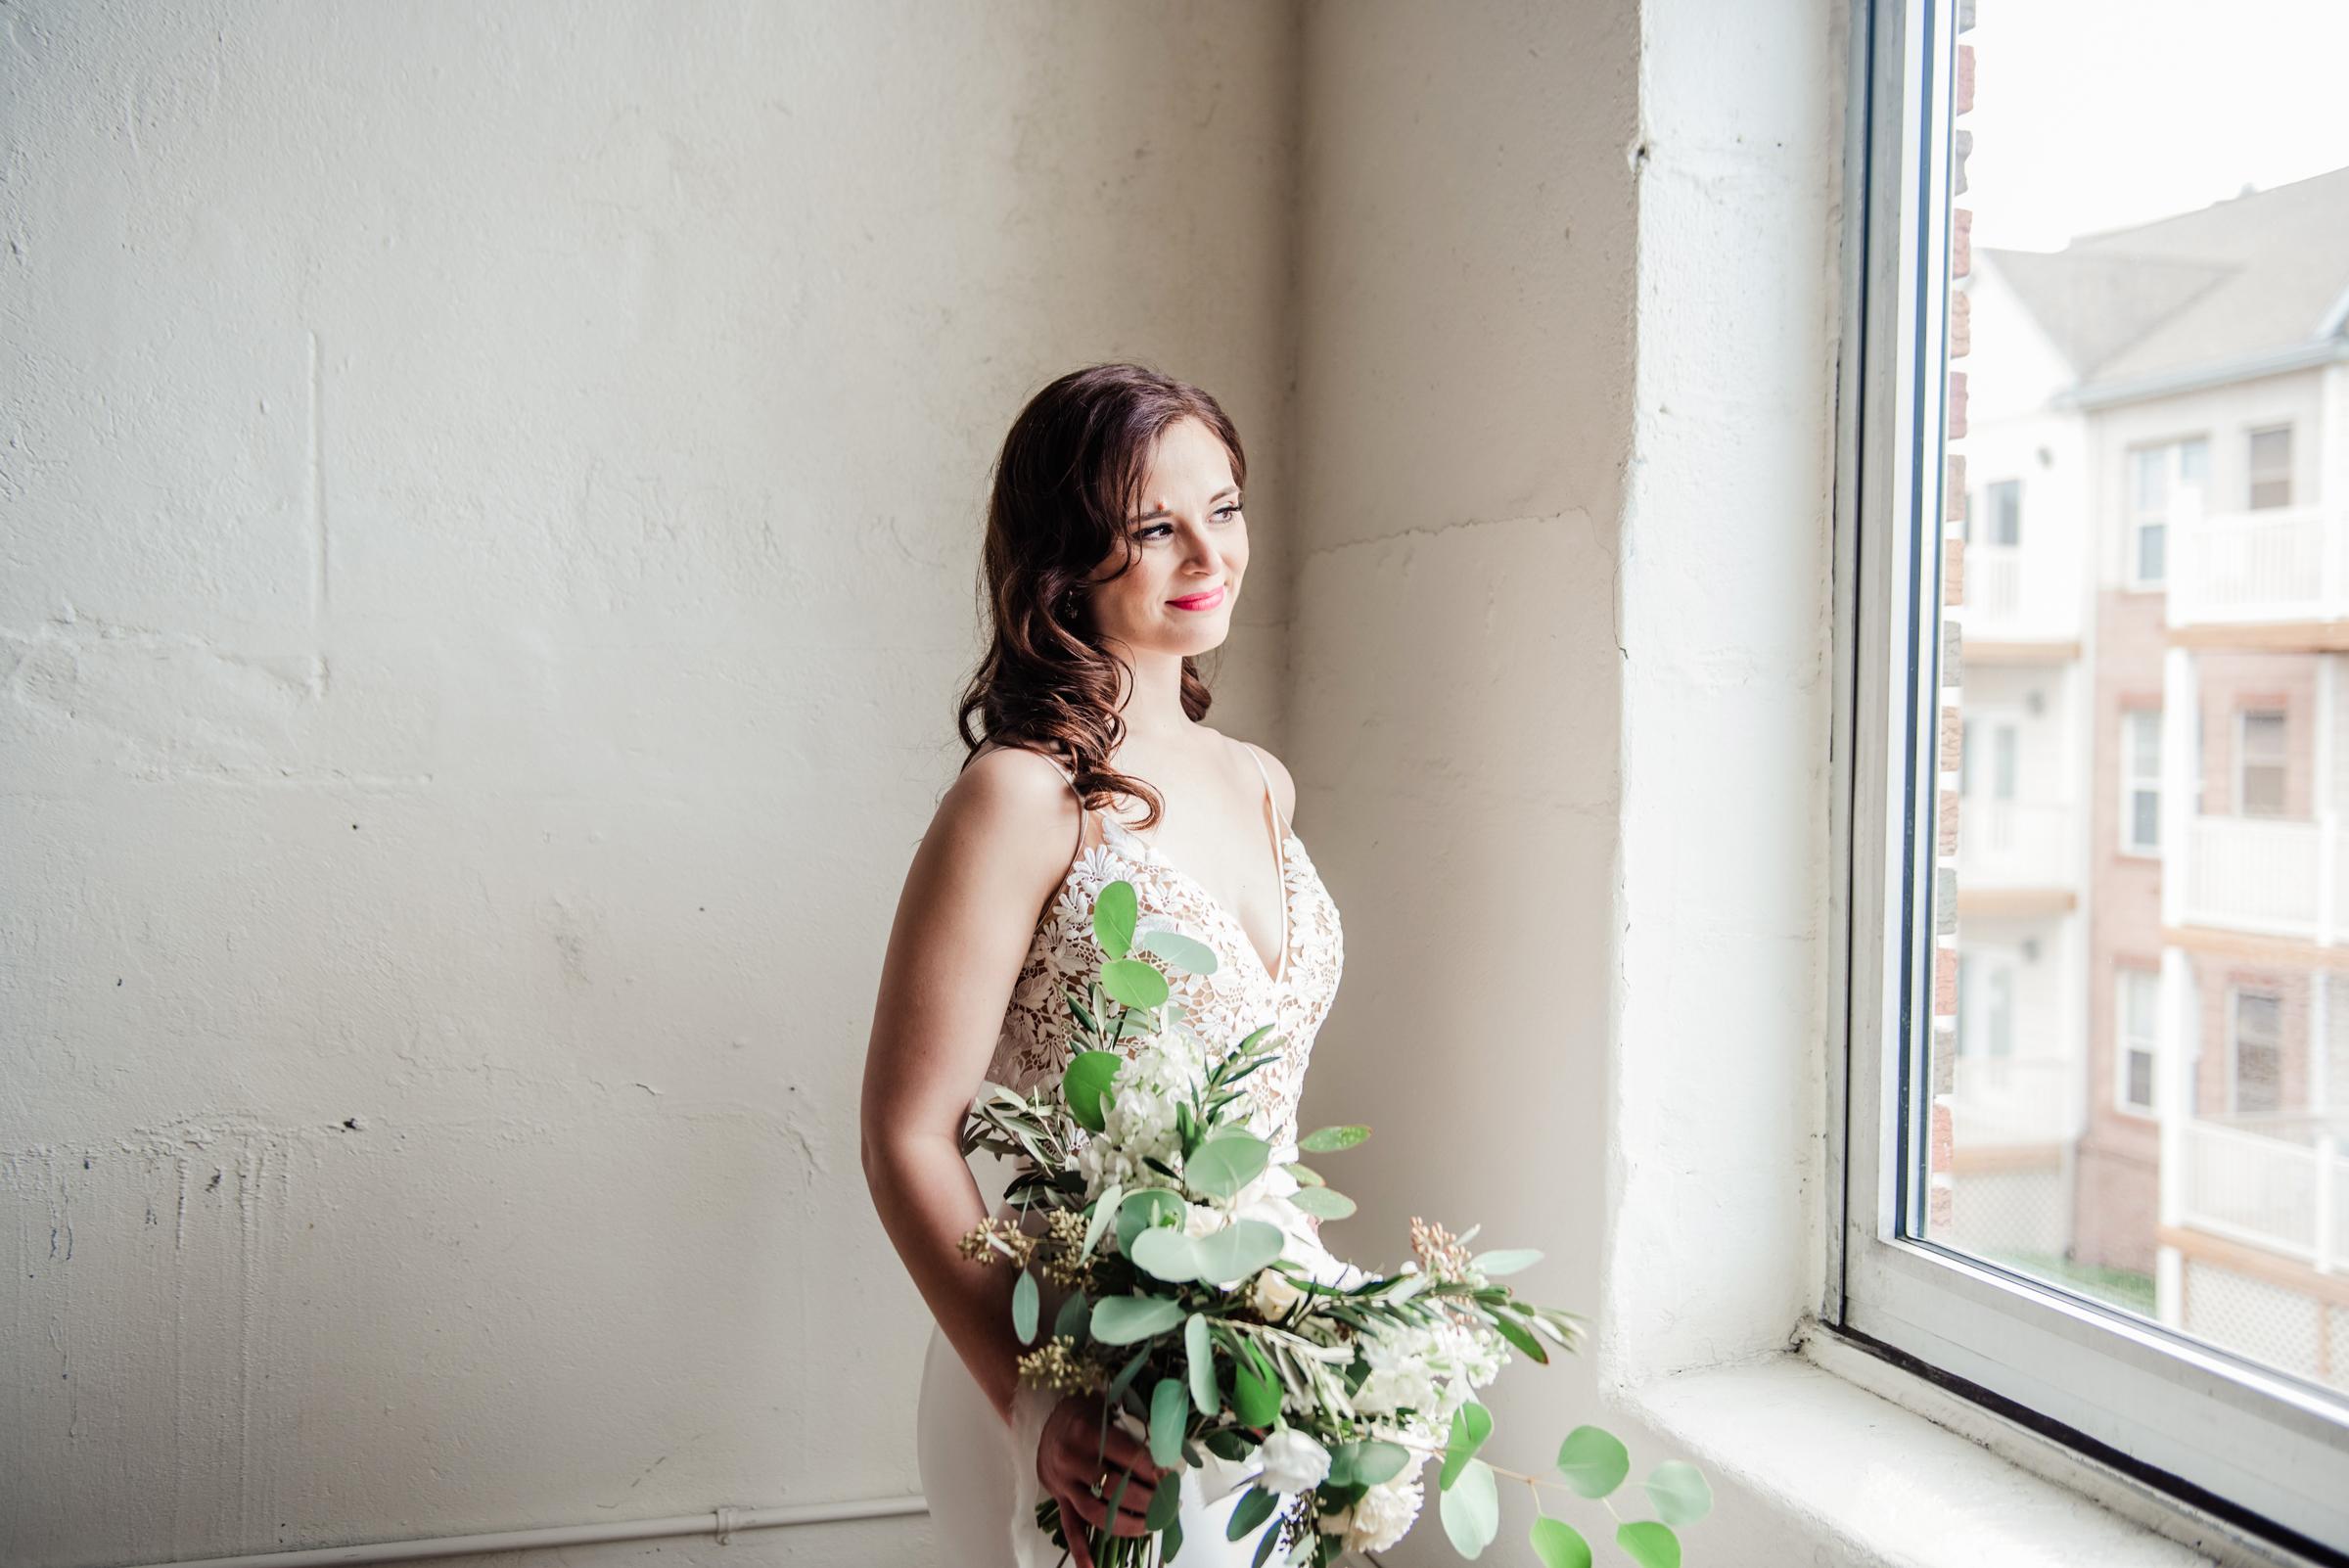 The_Arbor_LoftRochester_Wedding_JILL_STUDIO_Rochester_NY_Photographer_161521.jpg